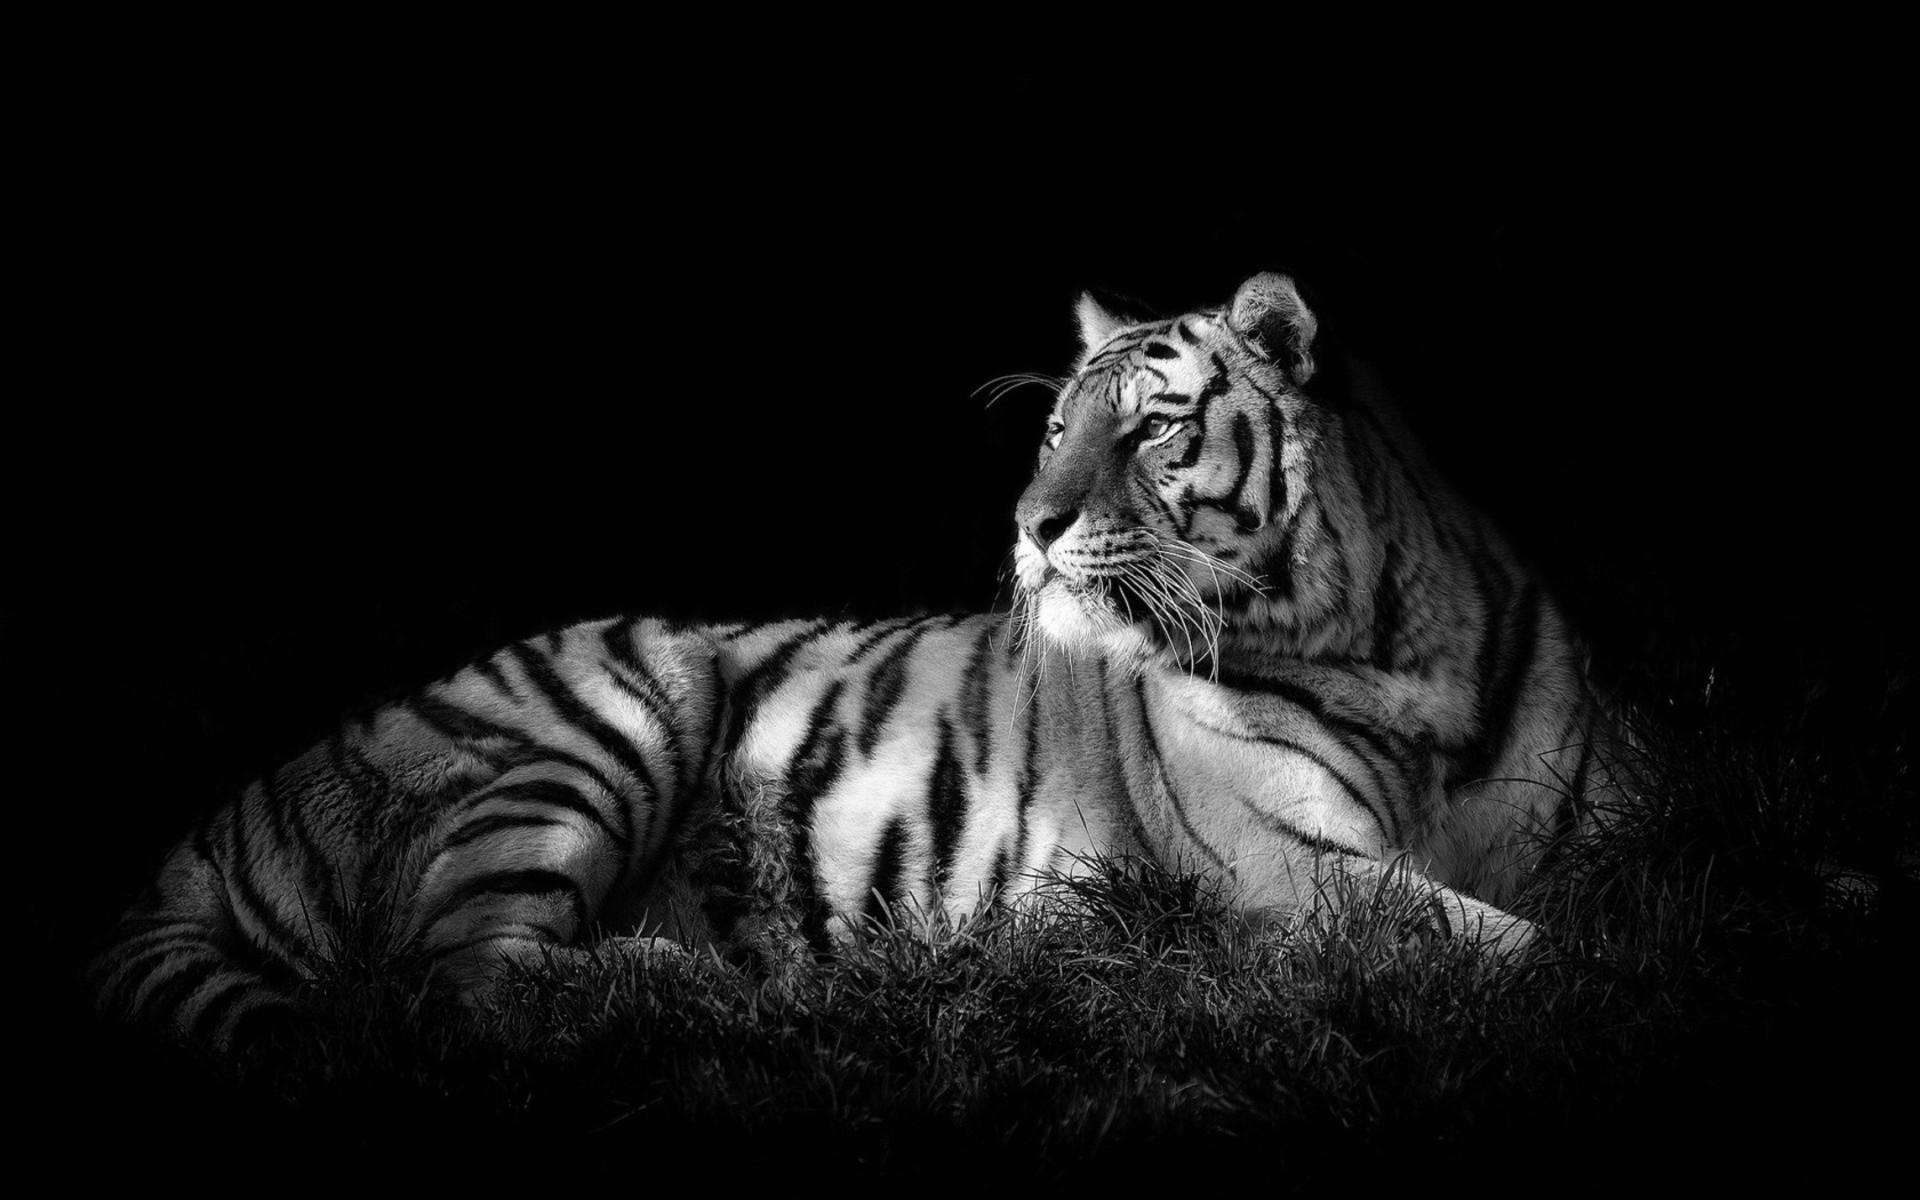 Tiger Black & White – Cats Wallpaper ID 1683309 – Desktop Nexus Animals